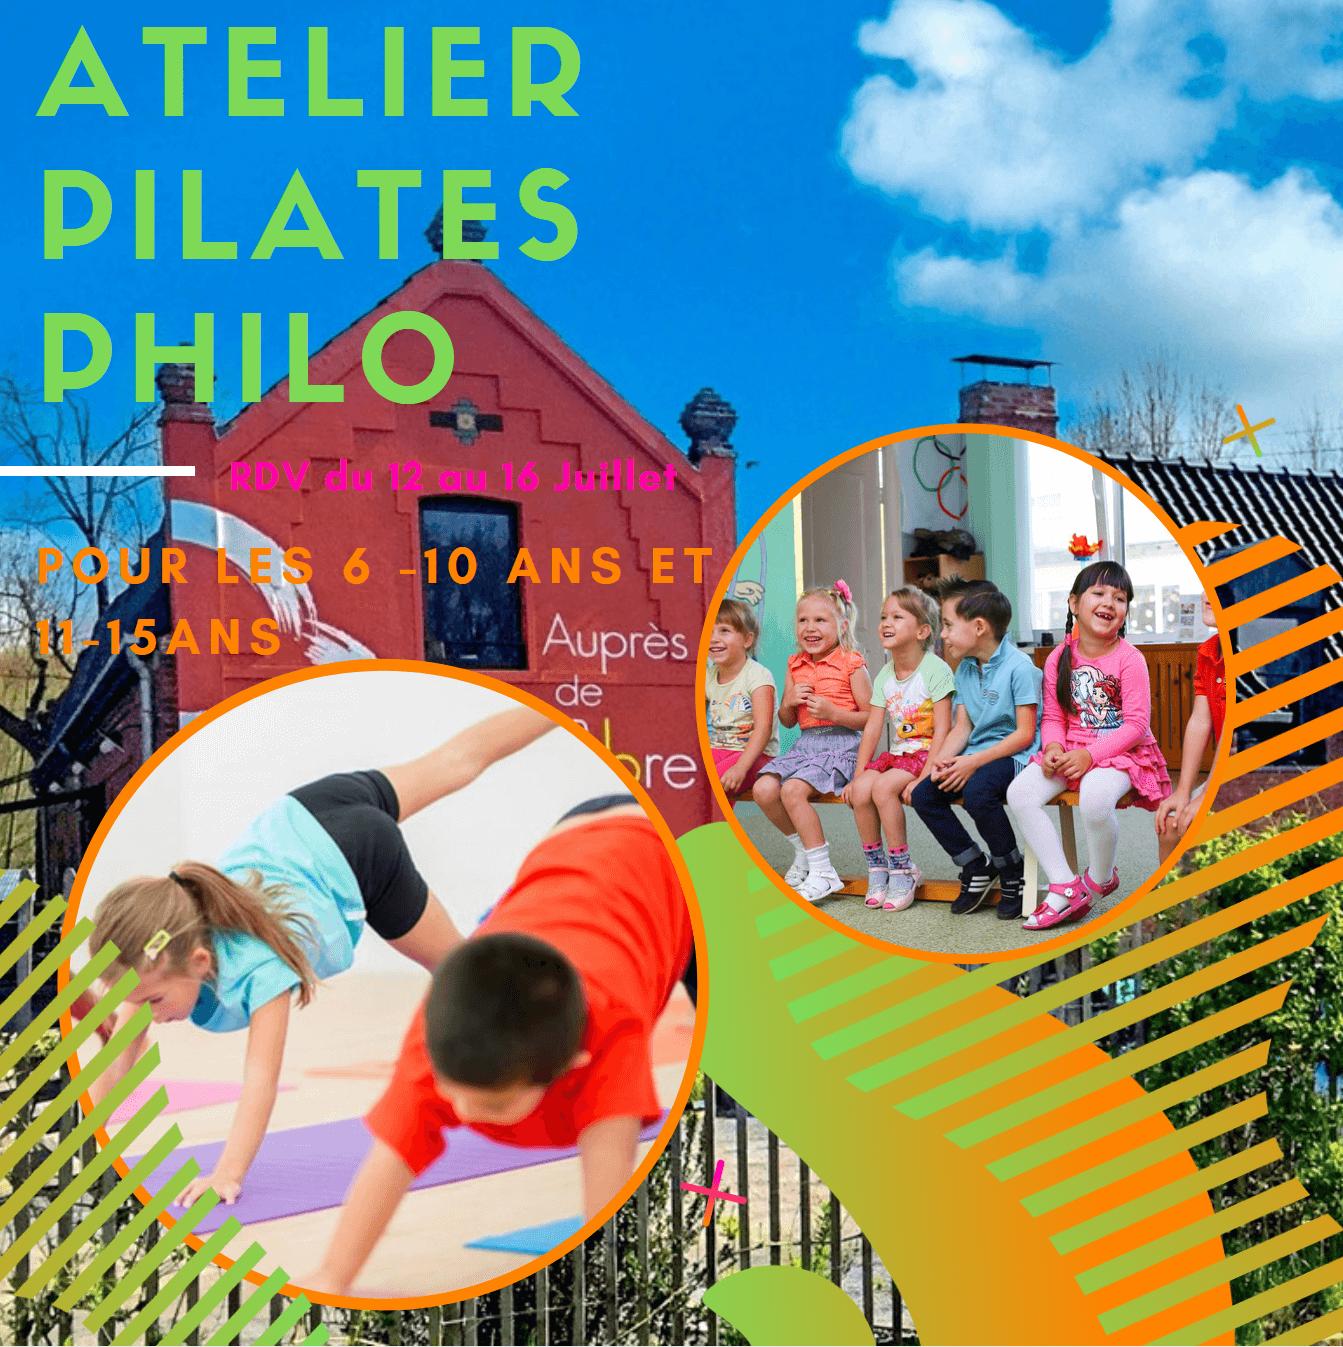 Atelier Pilates Philosophie